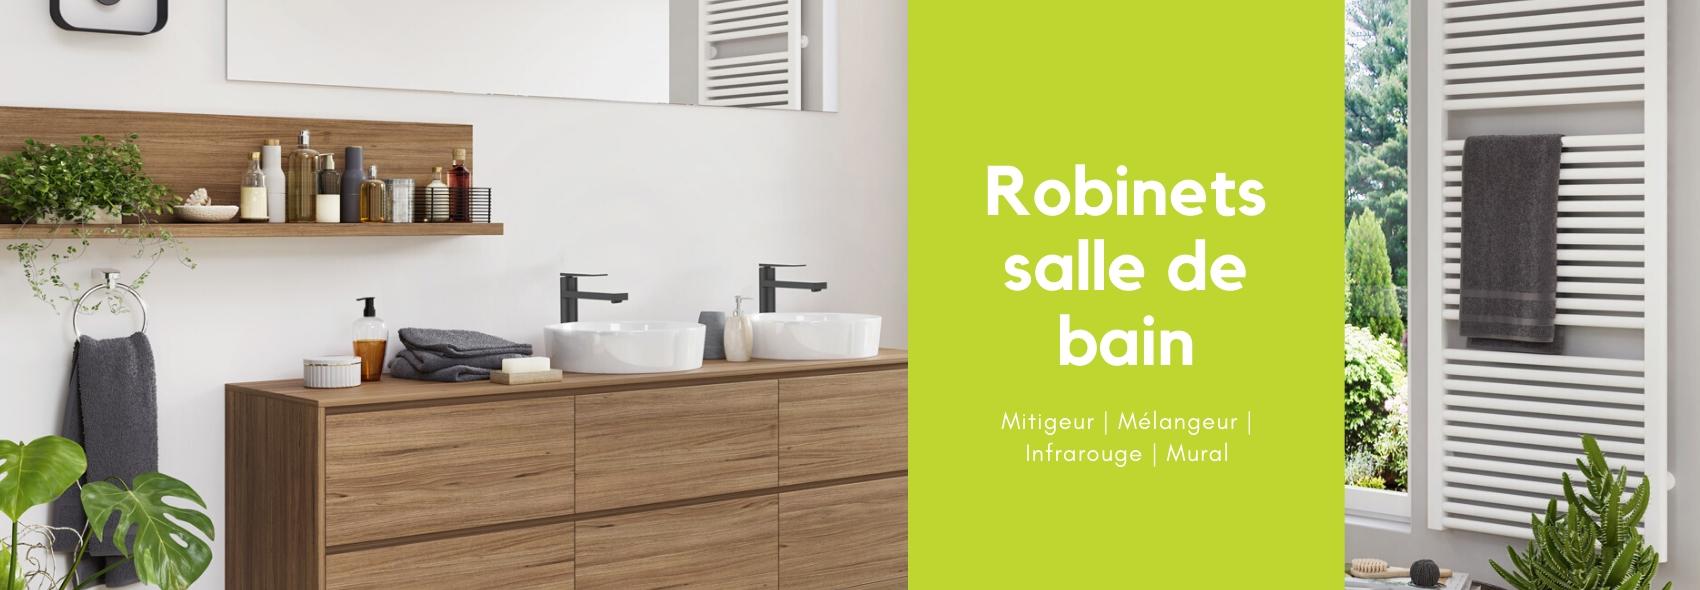 Robinets salle de bain